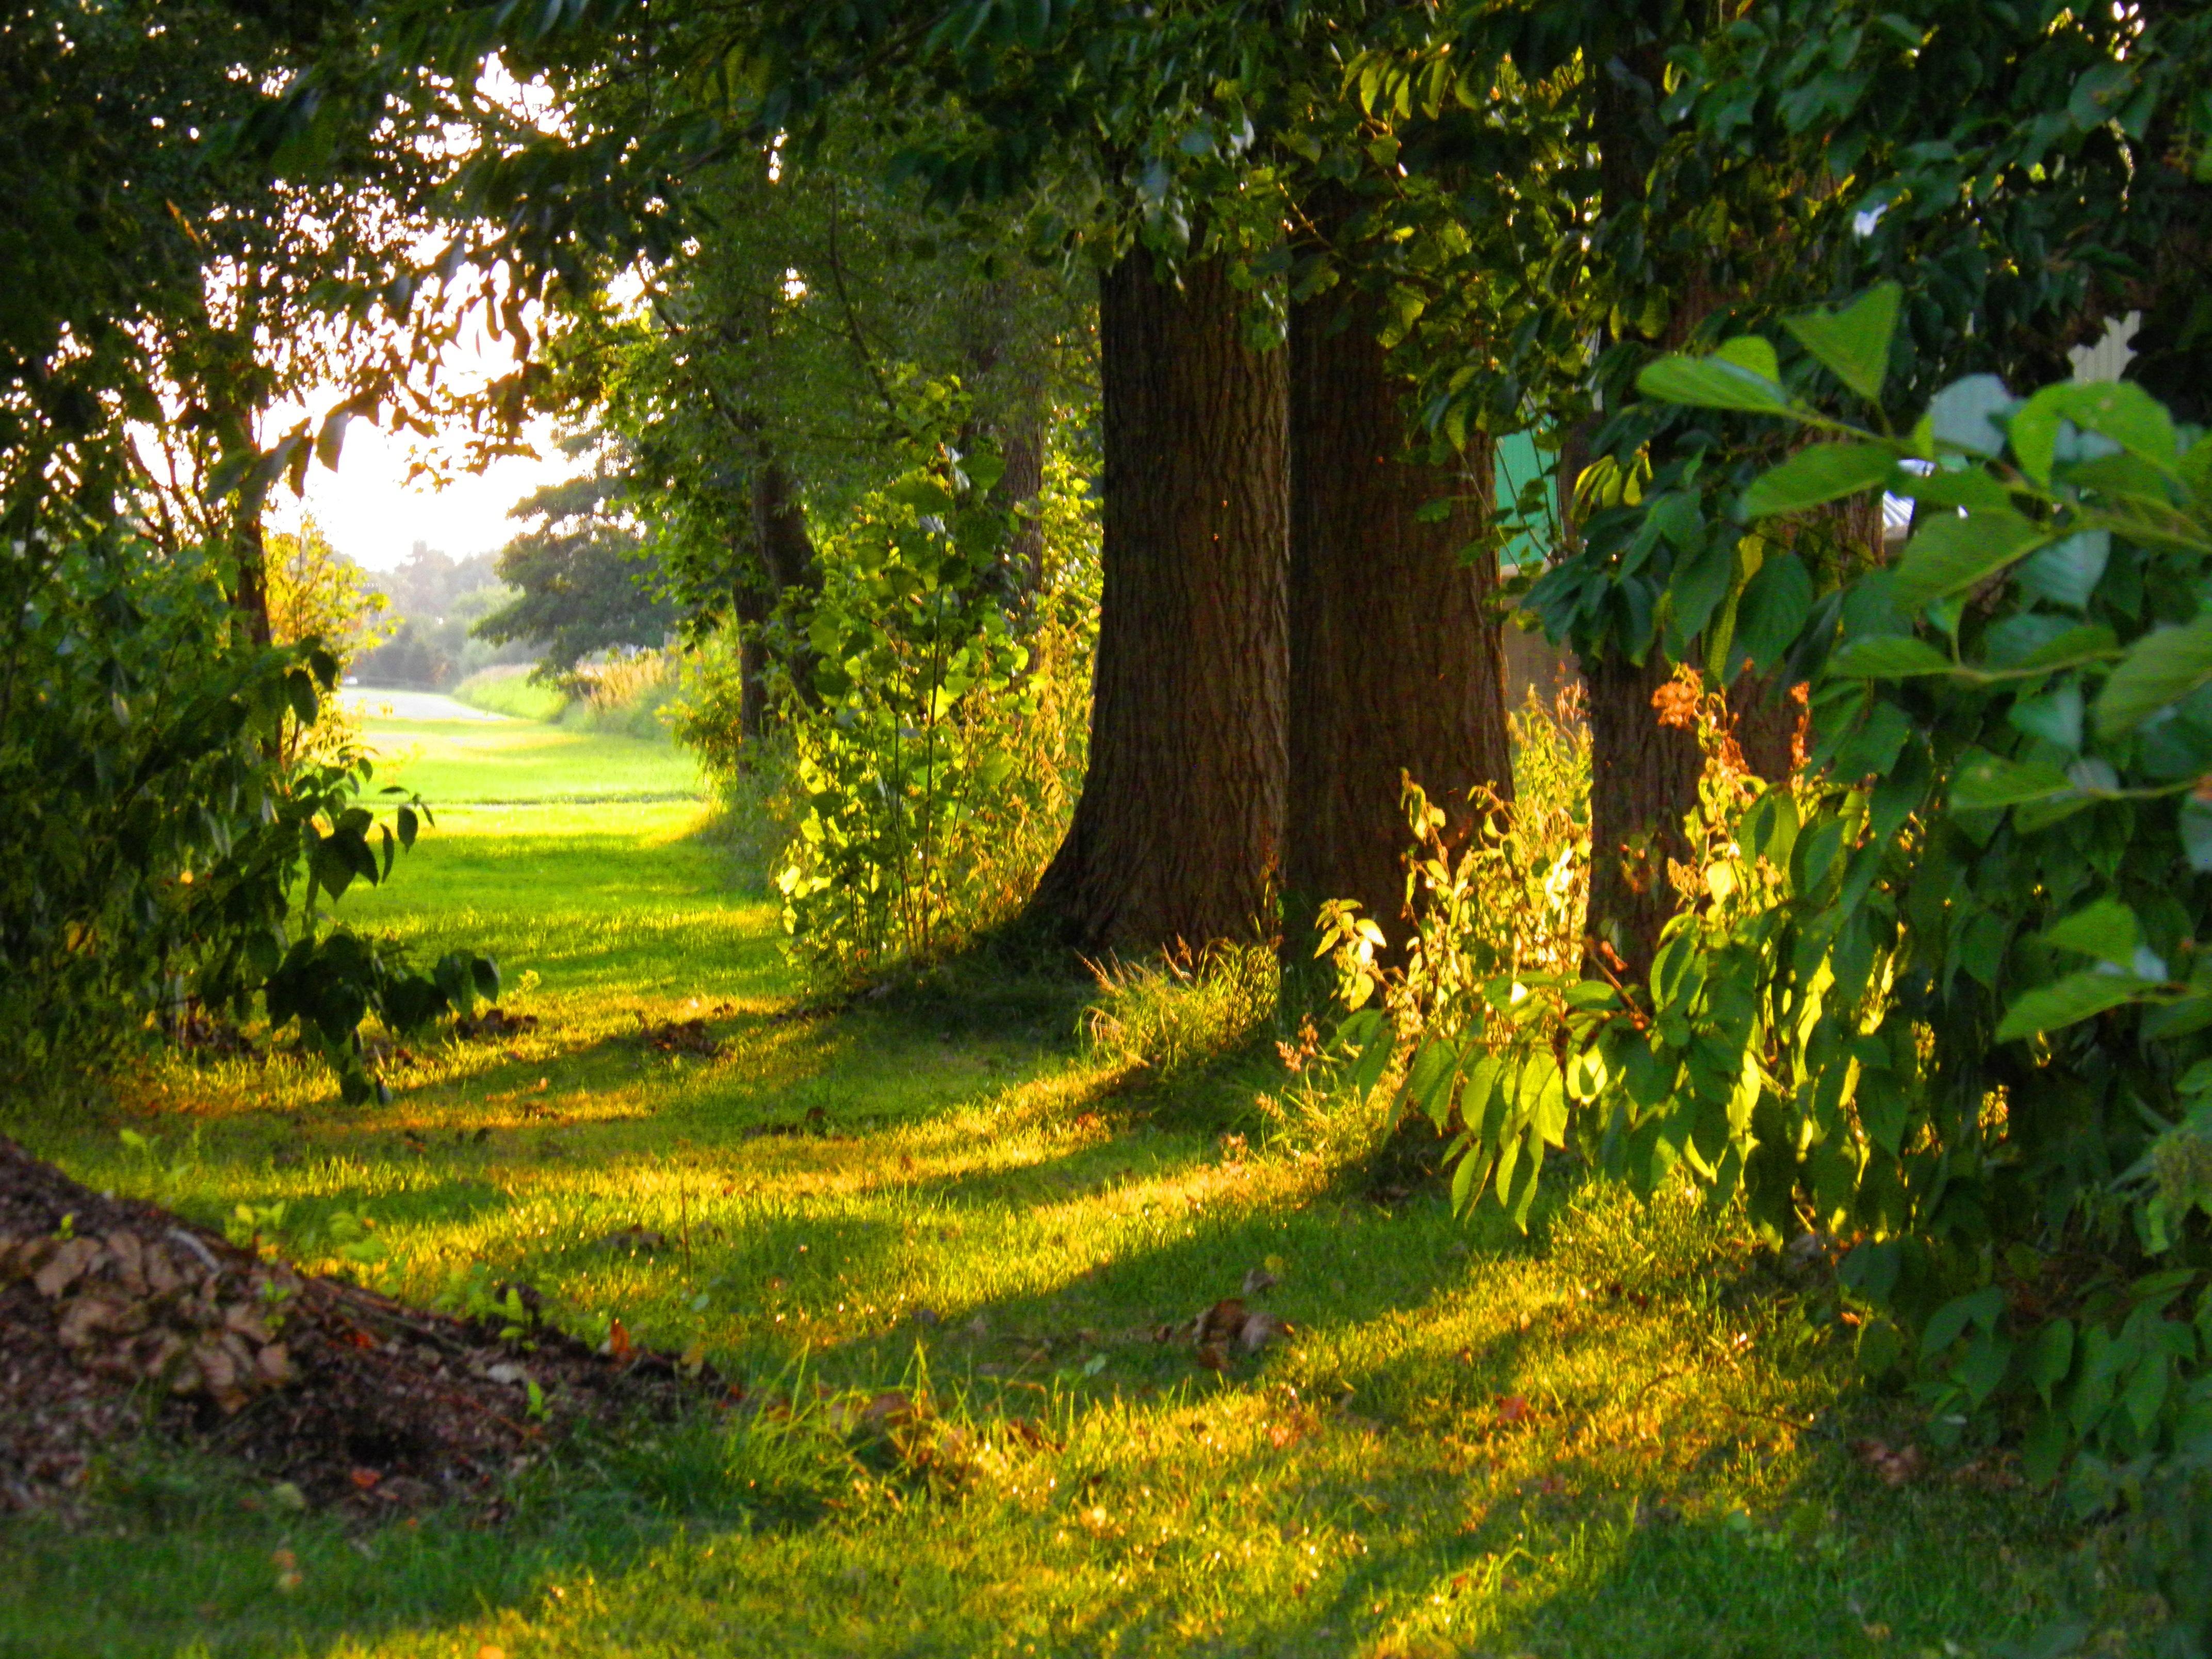 Banco de imagens panorama natureza floresta por do sol gramado prado luz solar folha for El super garden grove